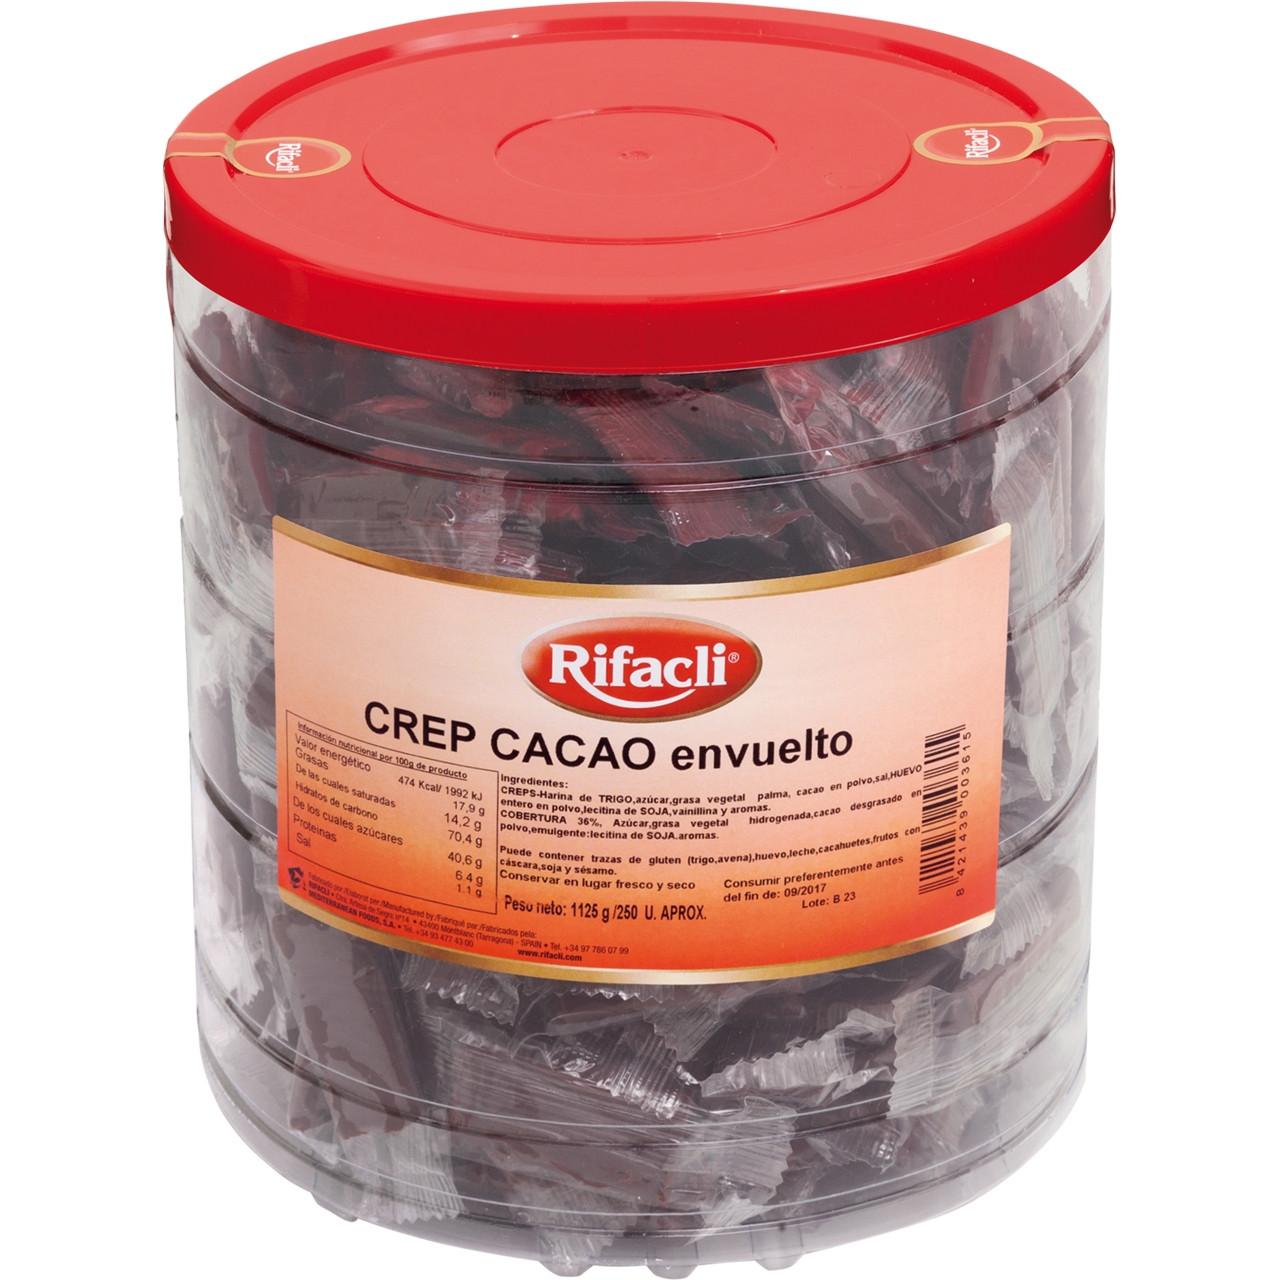 Rifacli-crep al cacao 1.125g